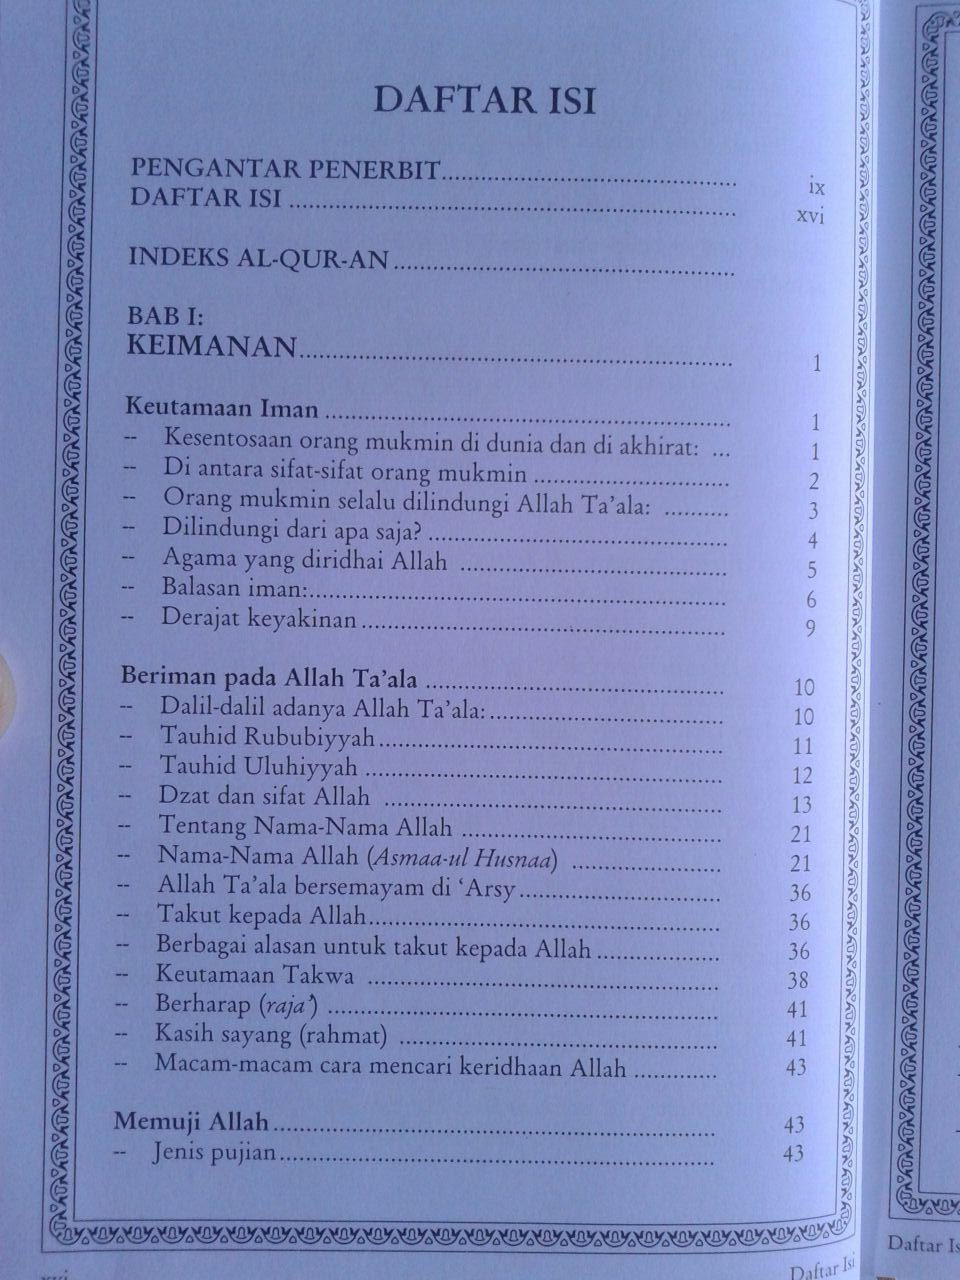 Buku Index Al-Qur'an Dalam Shahih Tafsir Ibnu Katsir isi 3